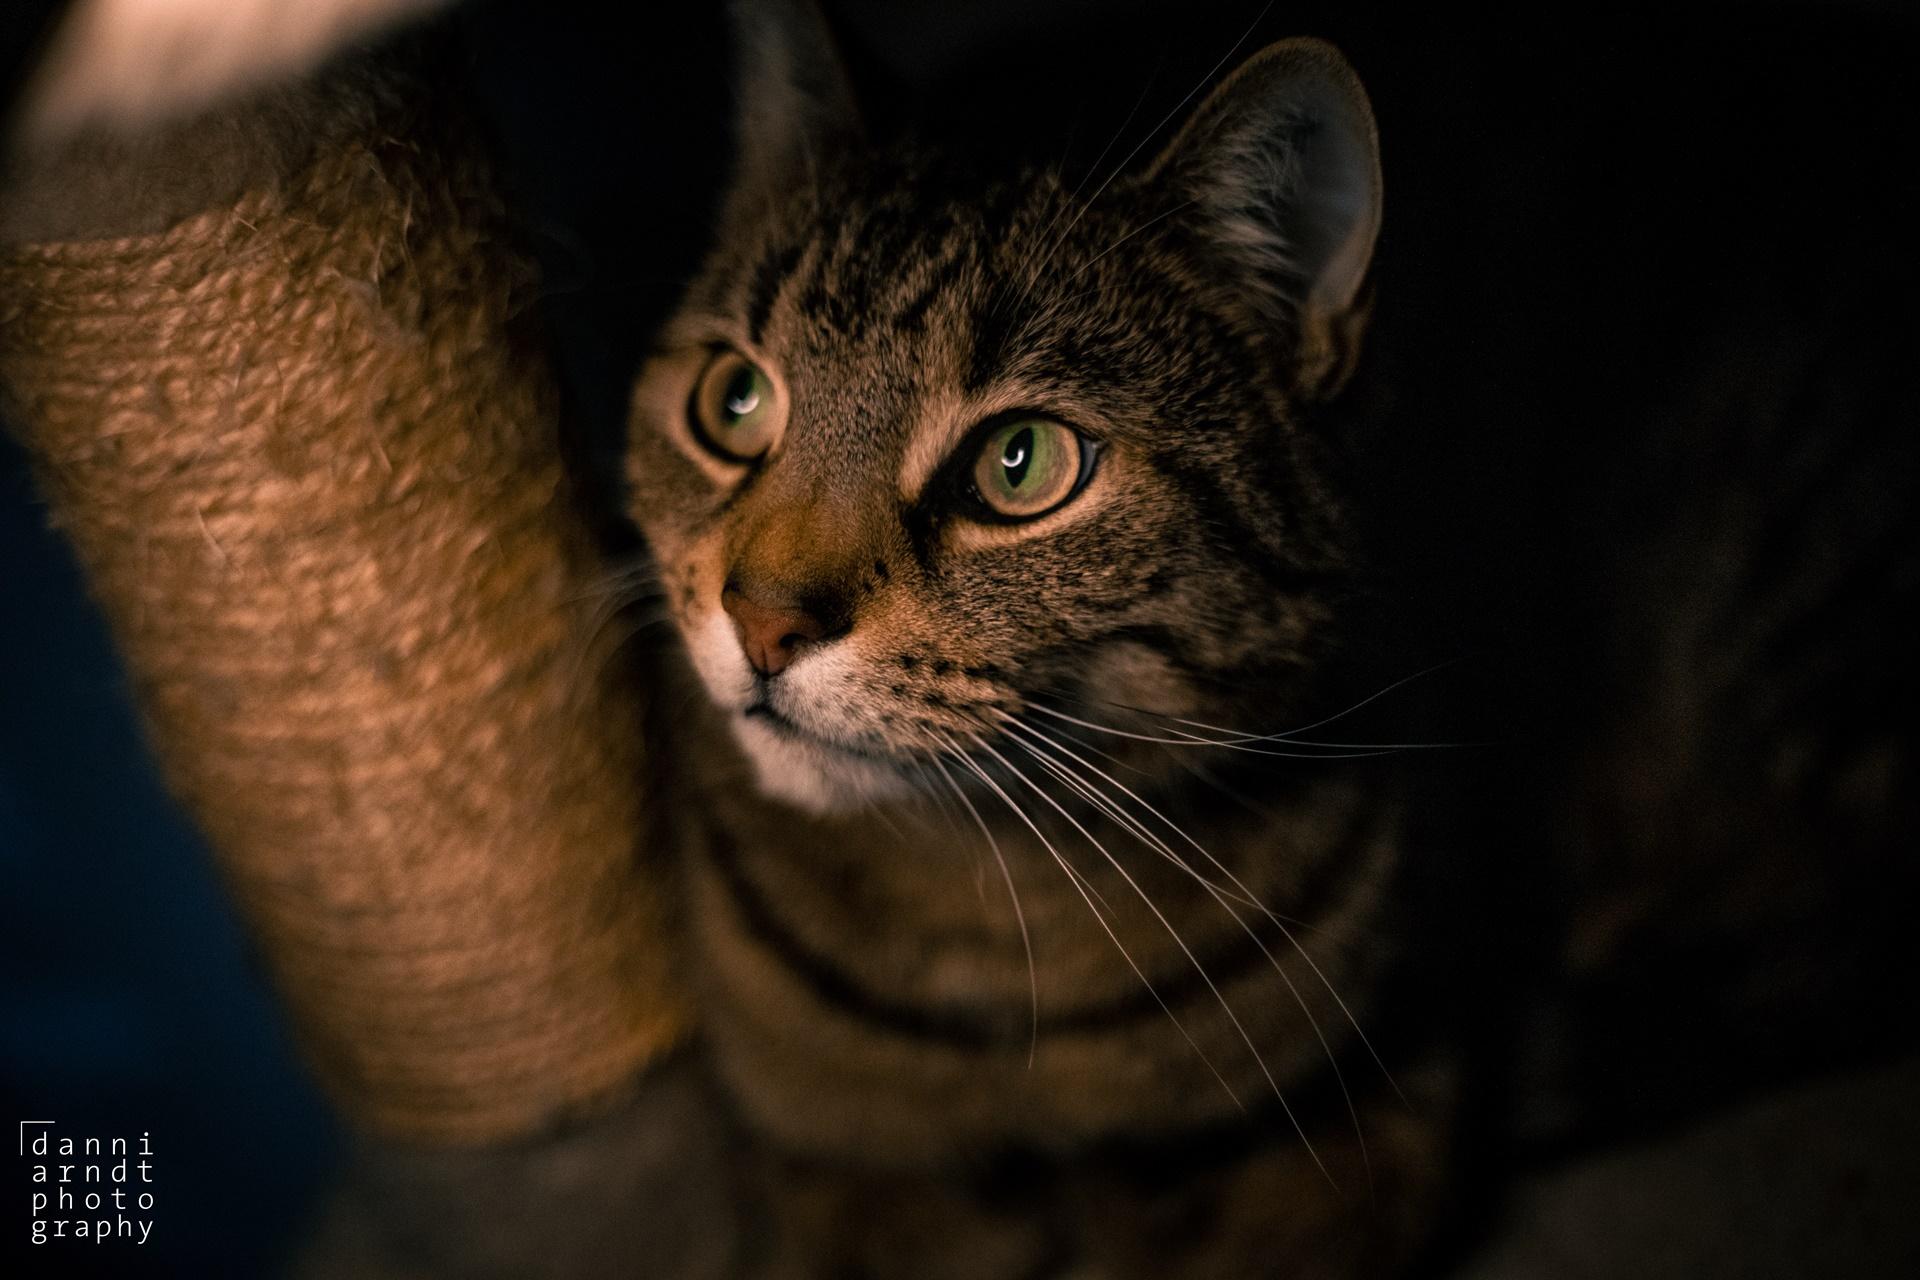 Cat ring light